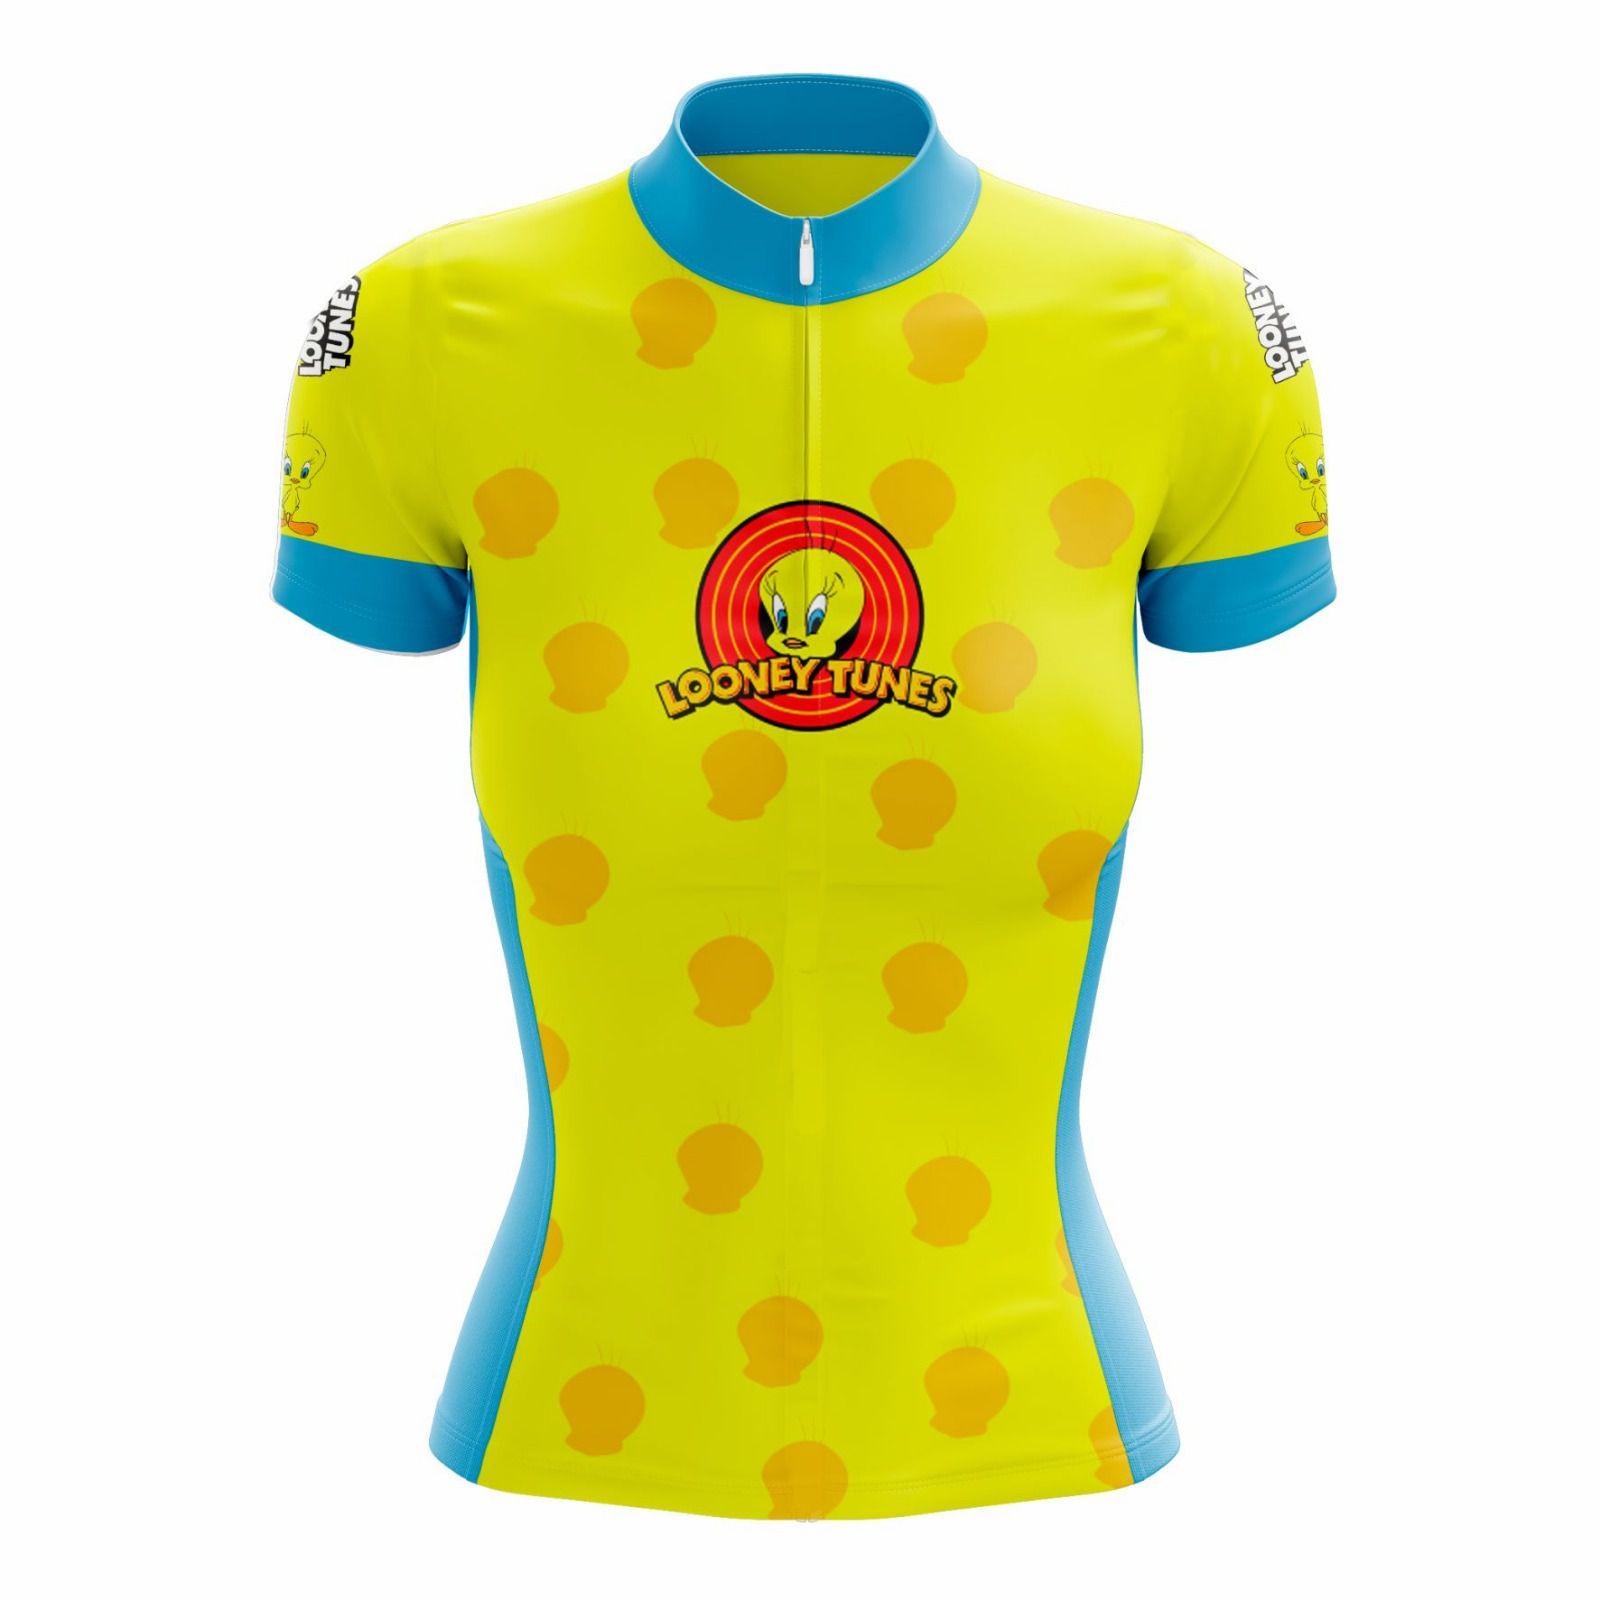 Camisa Ciclismo Feminina Looney Tunes Piu Piu - Scape